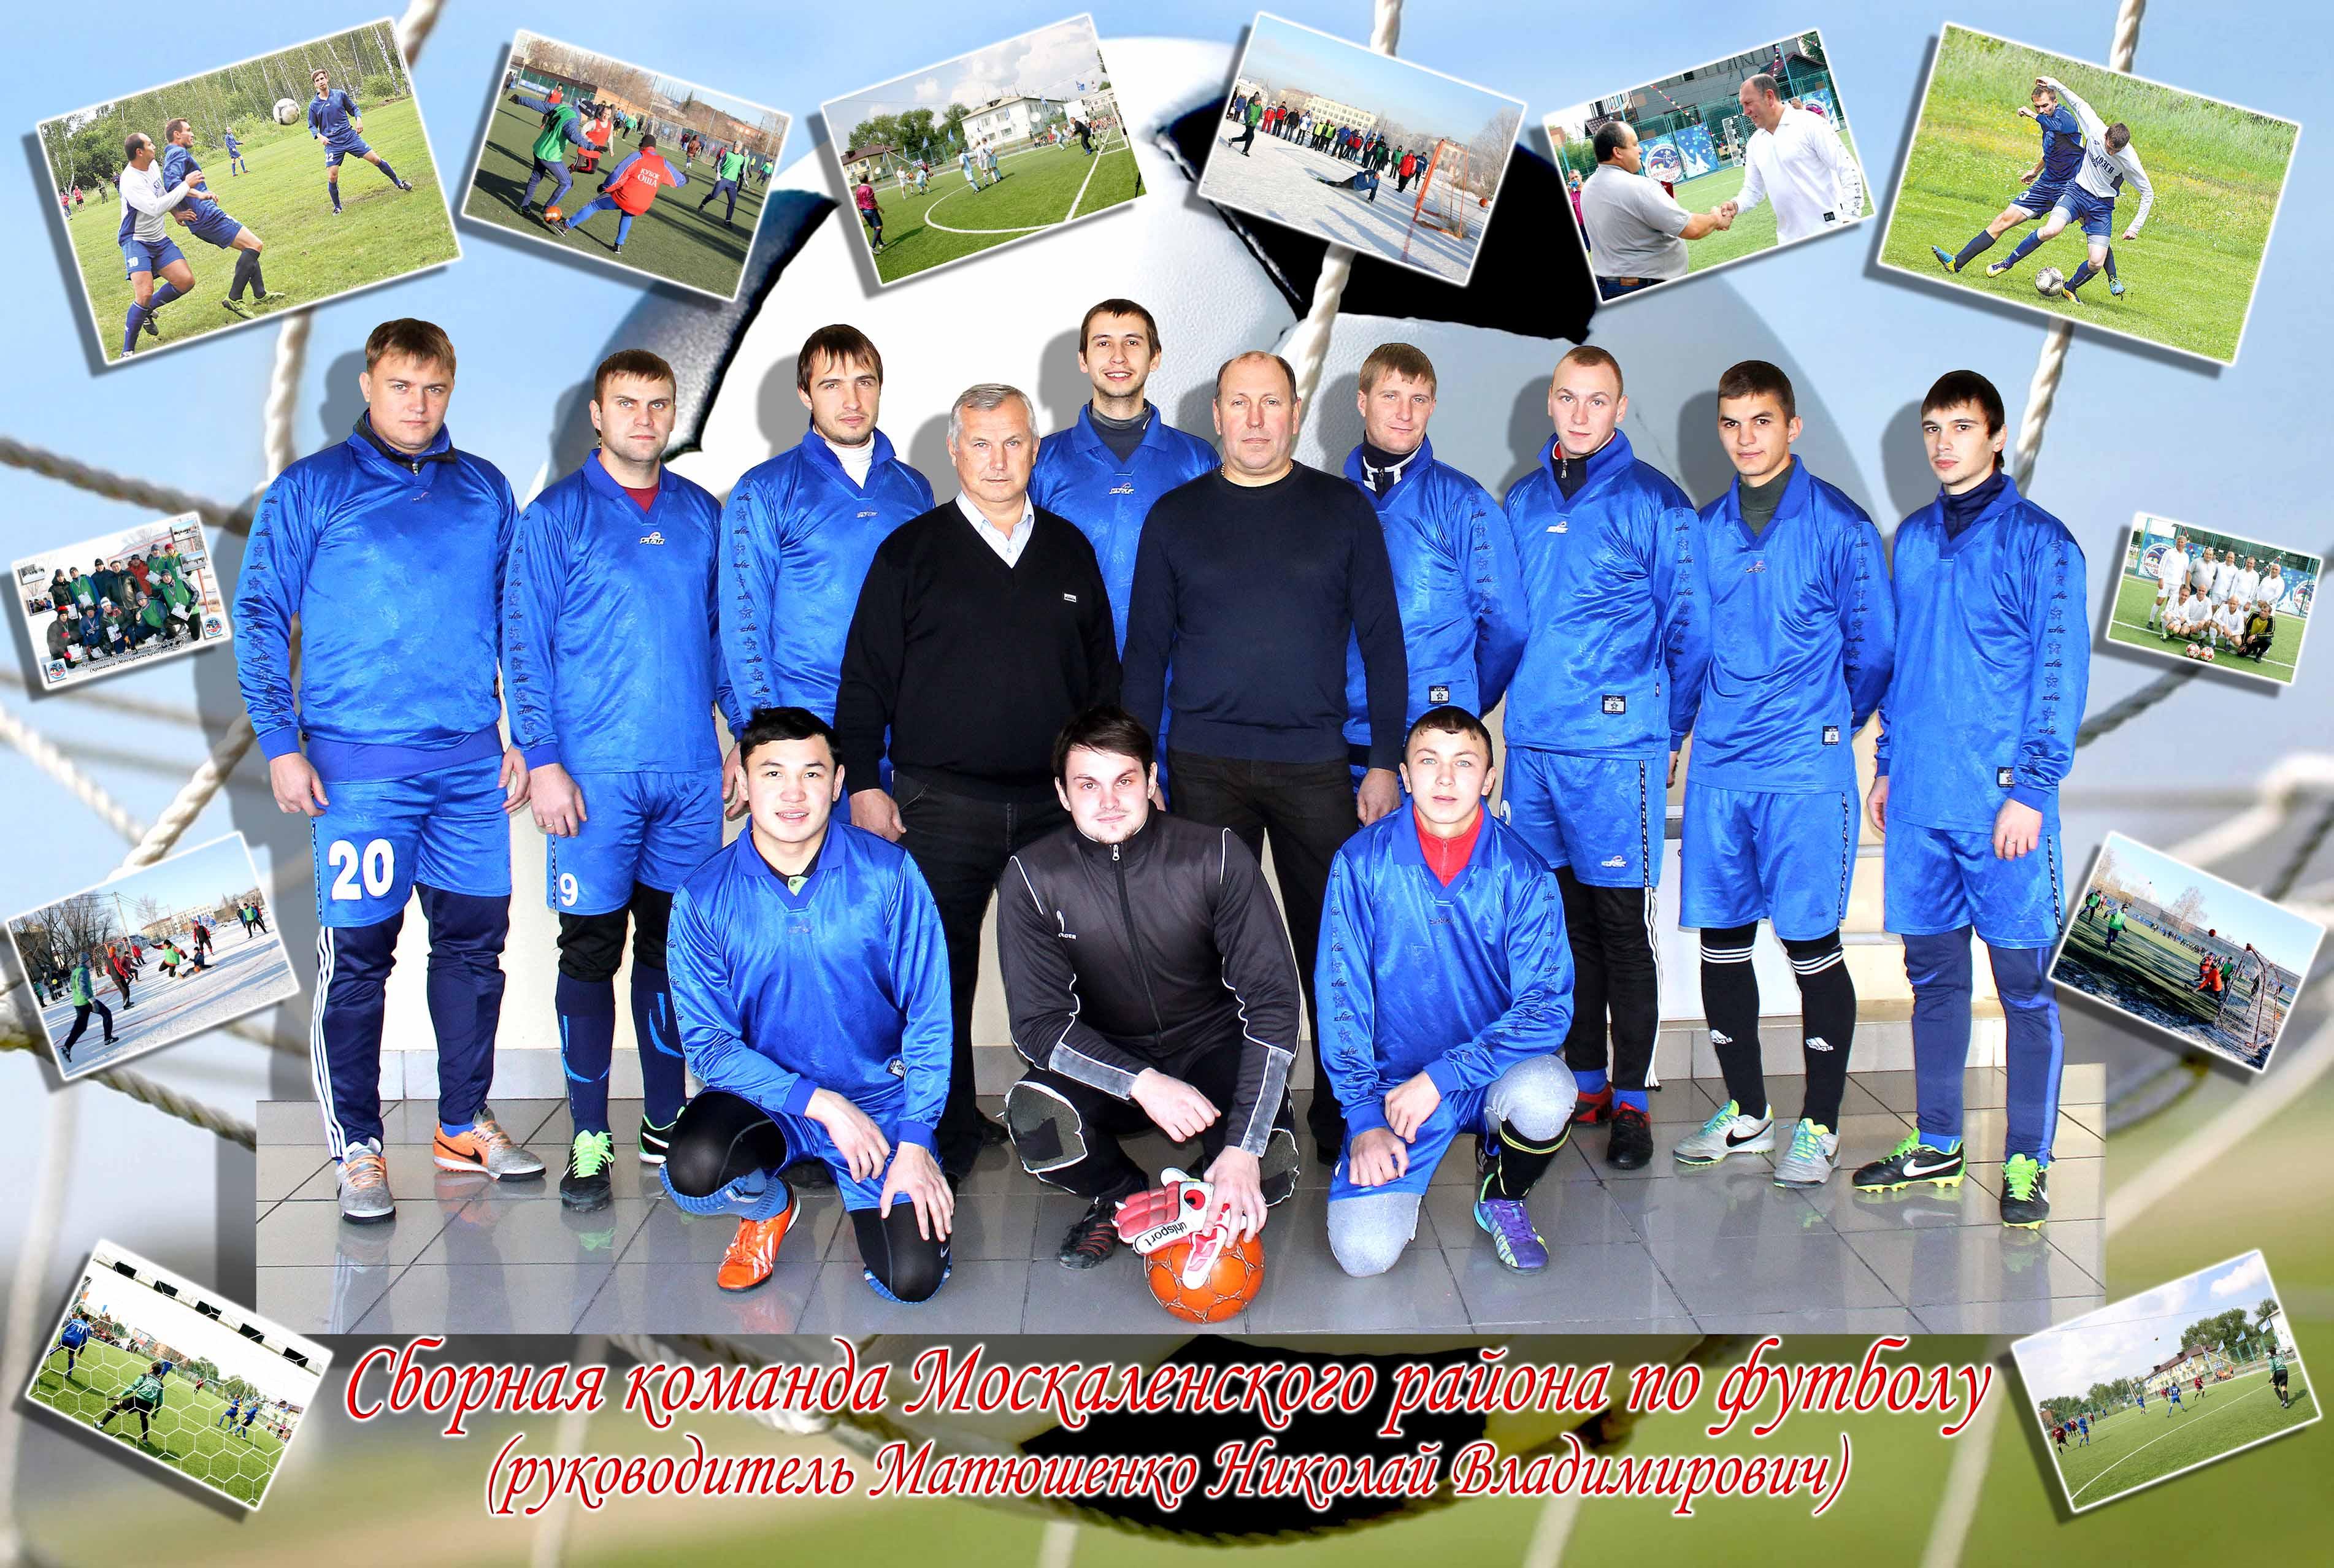 002 - Футбол